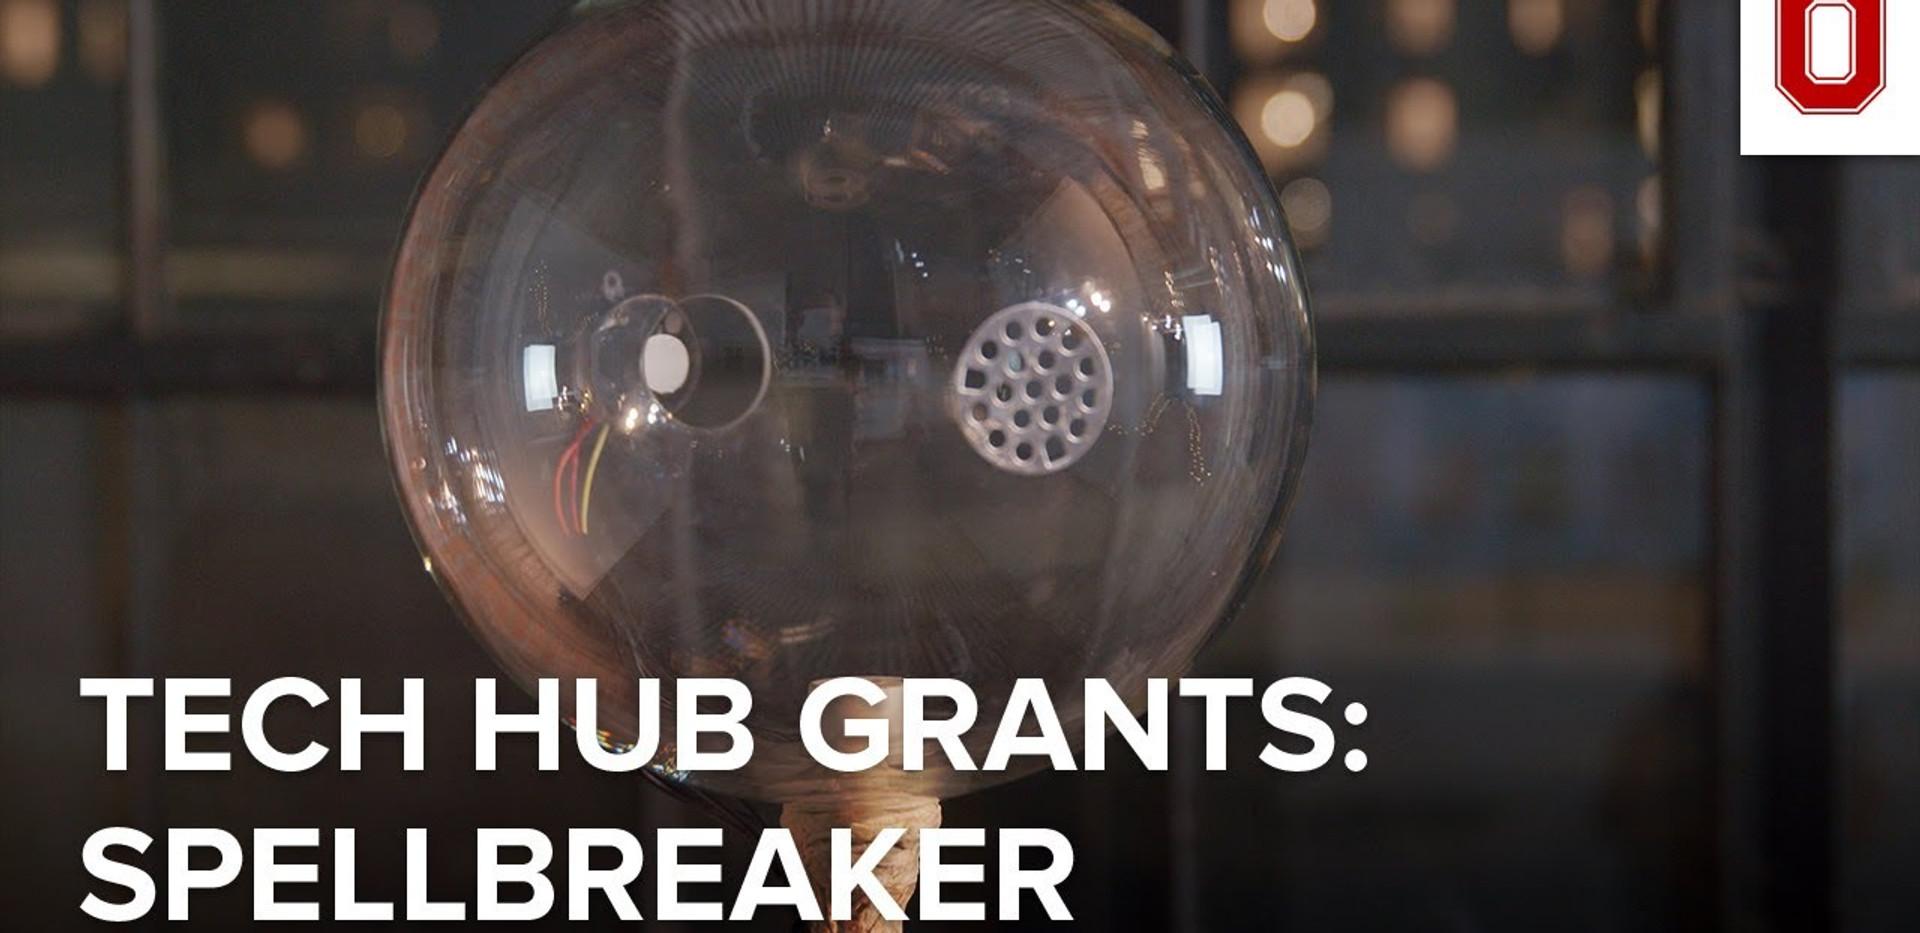 Spellbreaker (Breath Engine) 2017-18